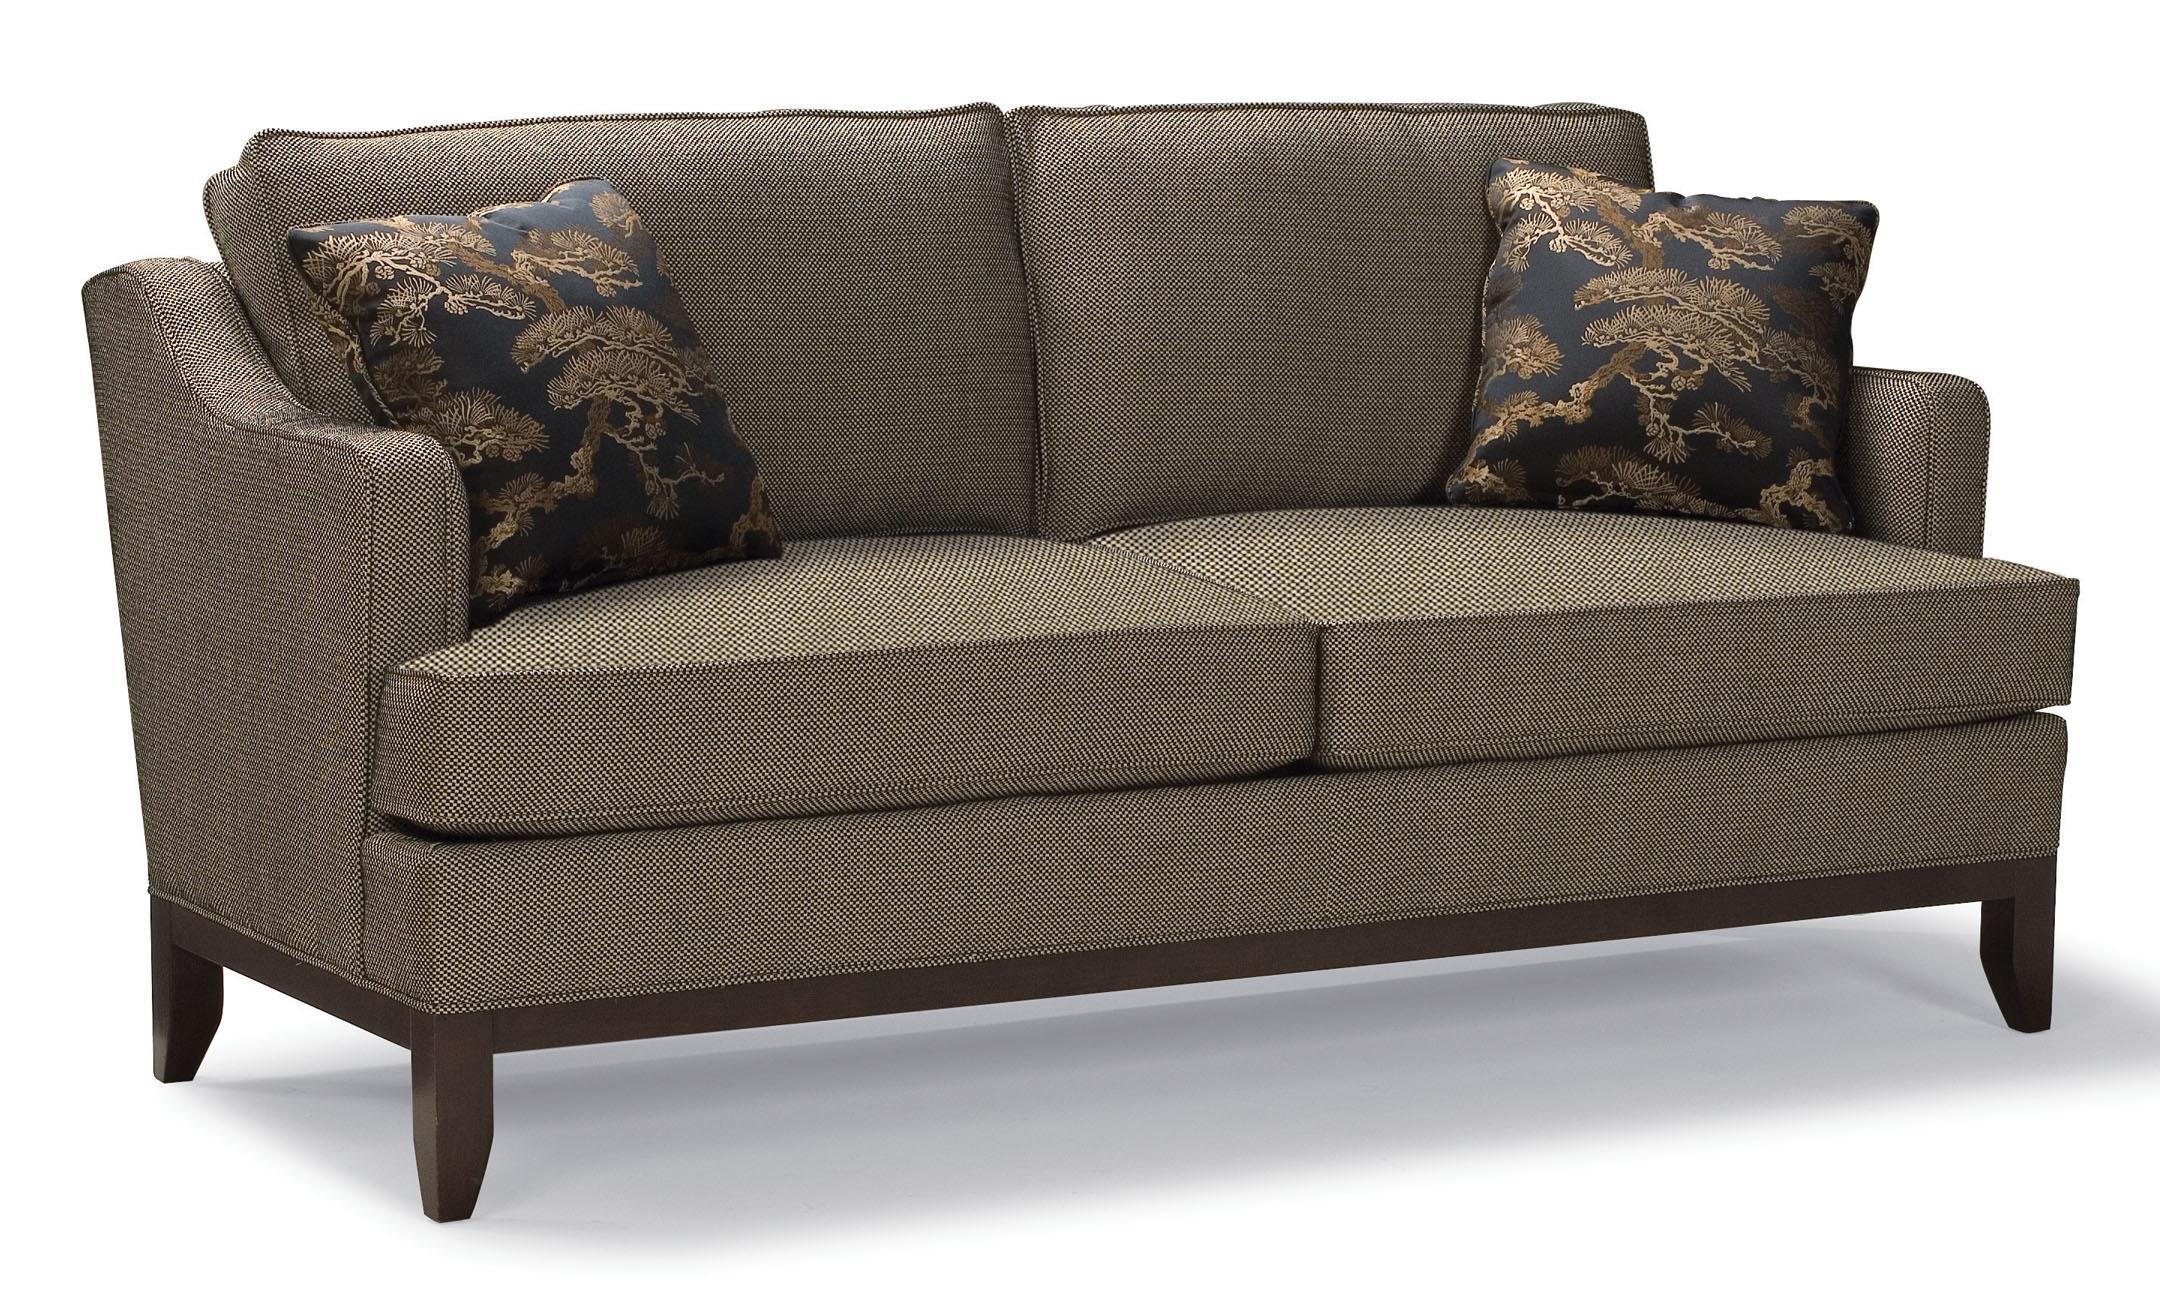 2714 Stationary Sofa by Grove Park at Sprintz Furniture